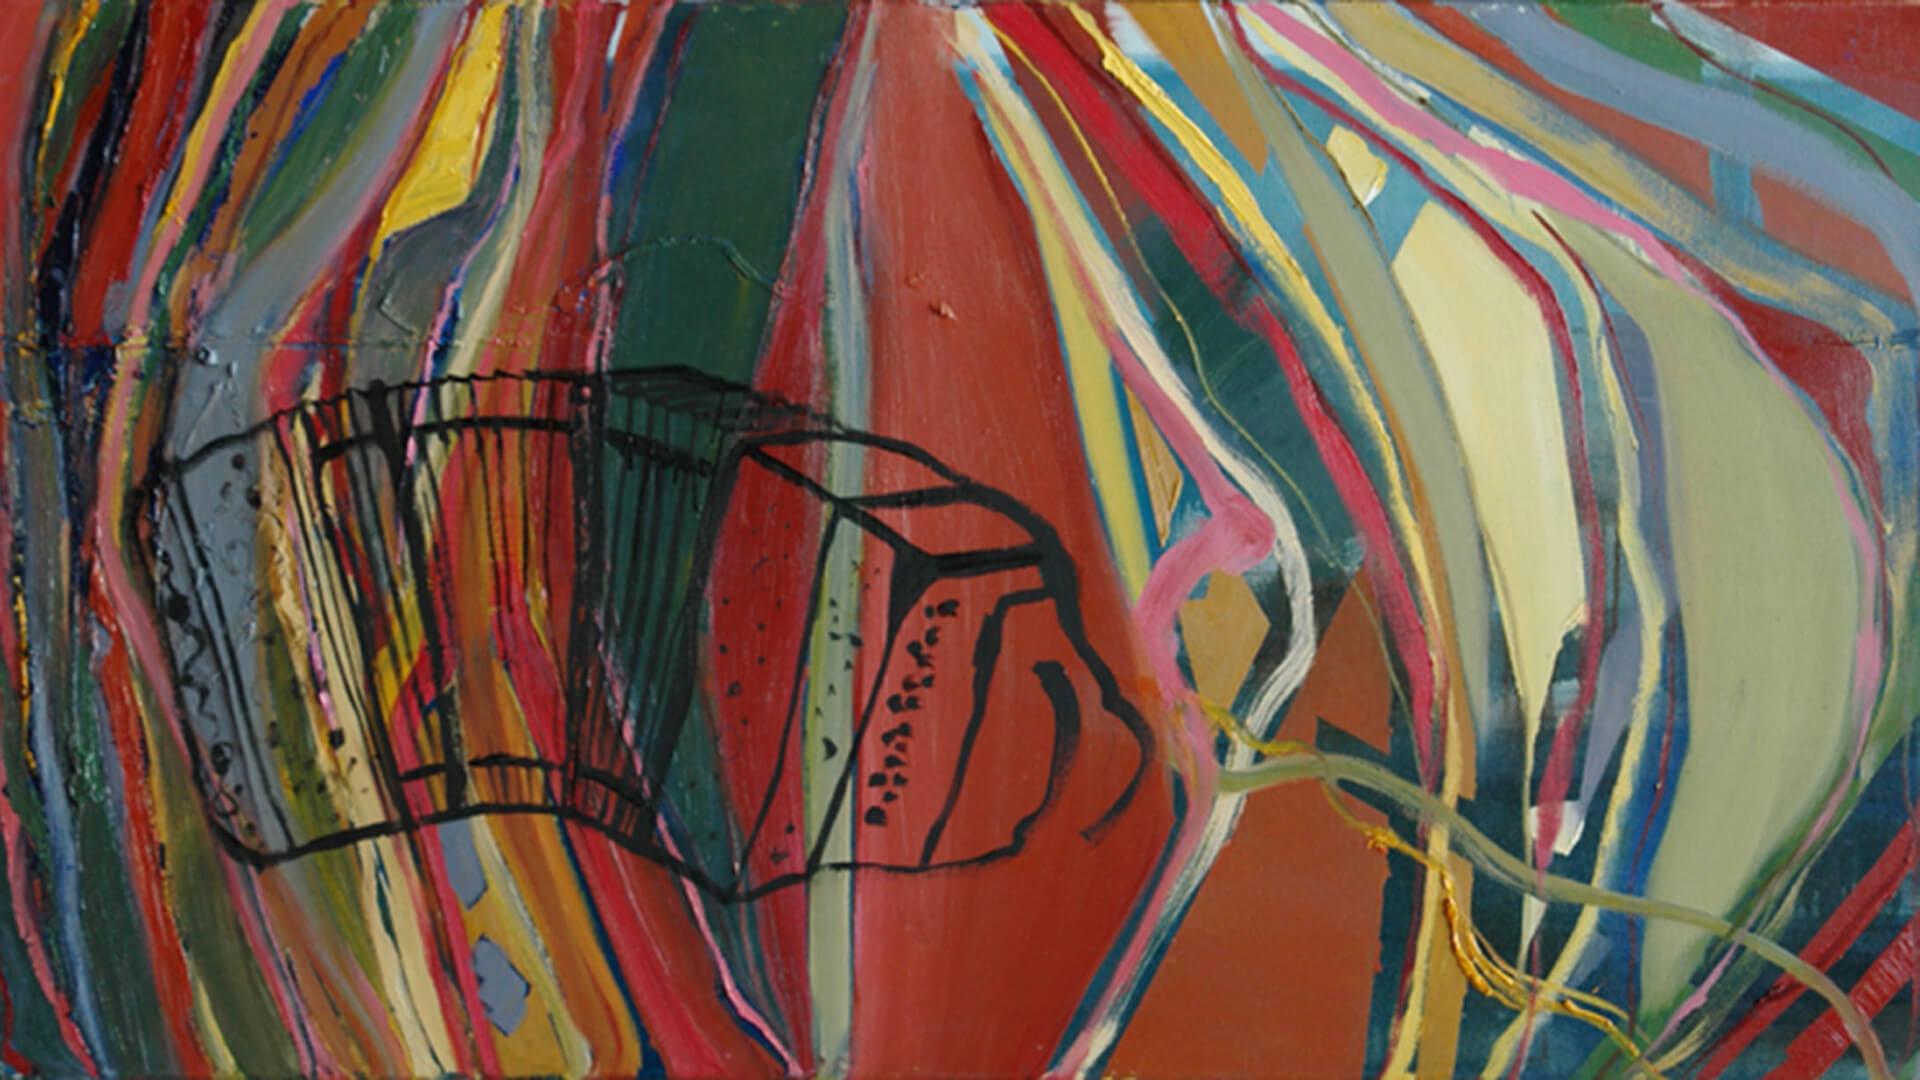 2007 - Oil on canvas. 70 cm. x 127 cm.